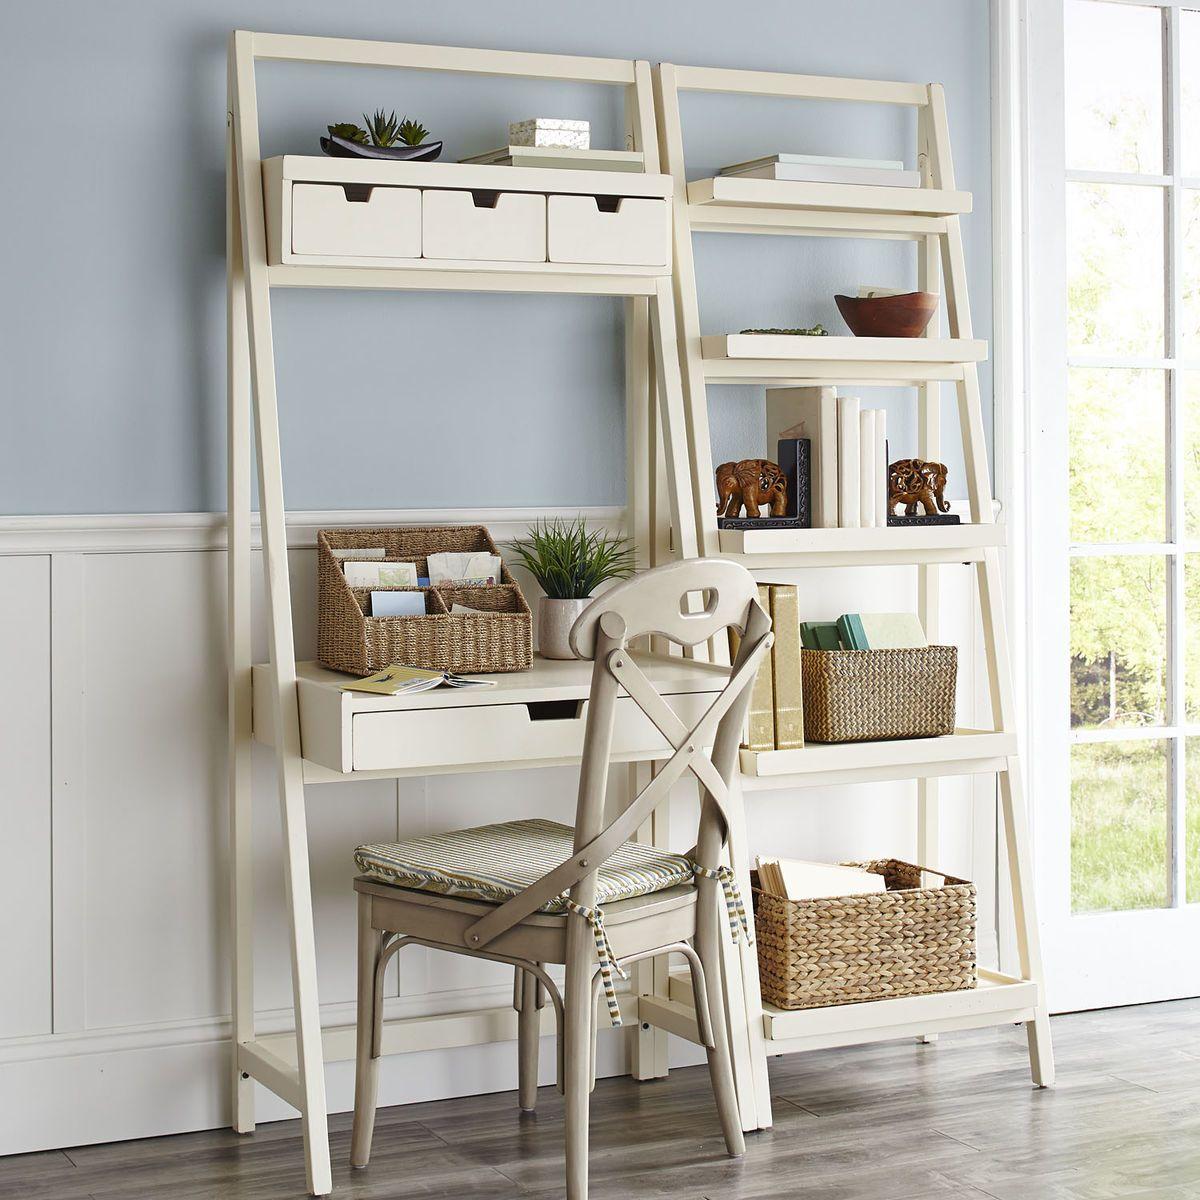 Ikea Office Indonesia: Morgan Antique White Desk